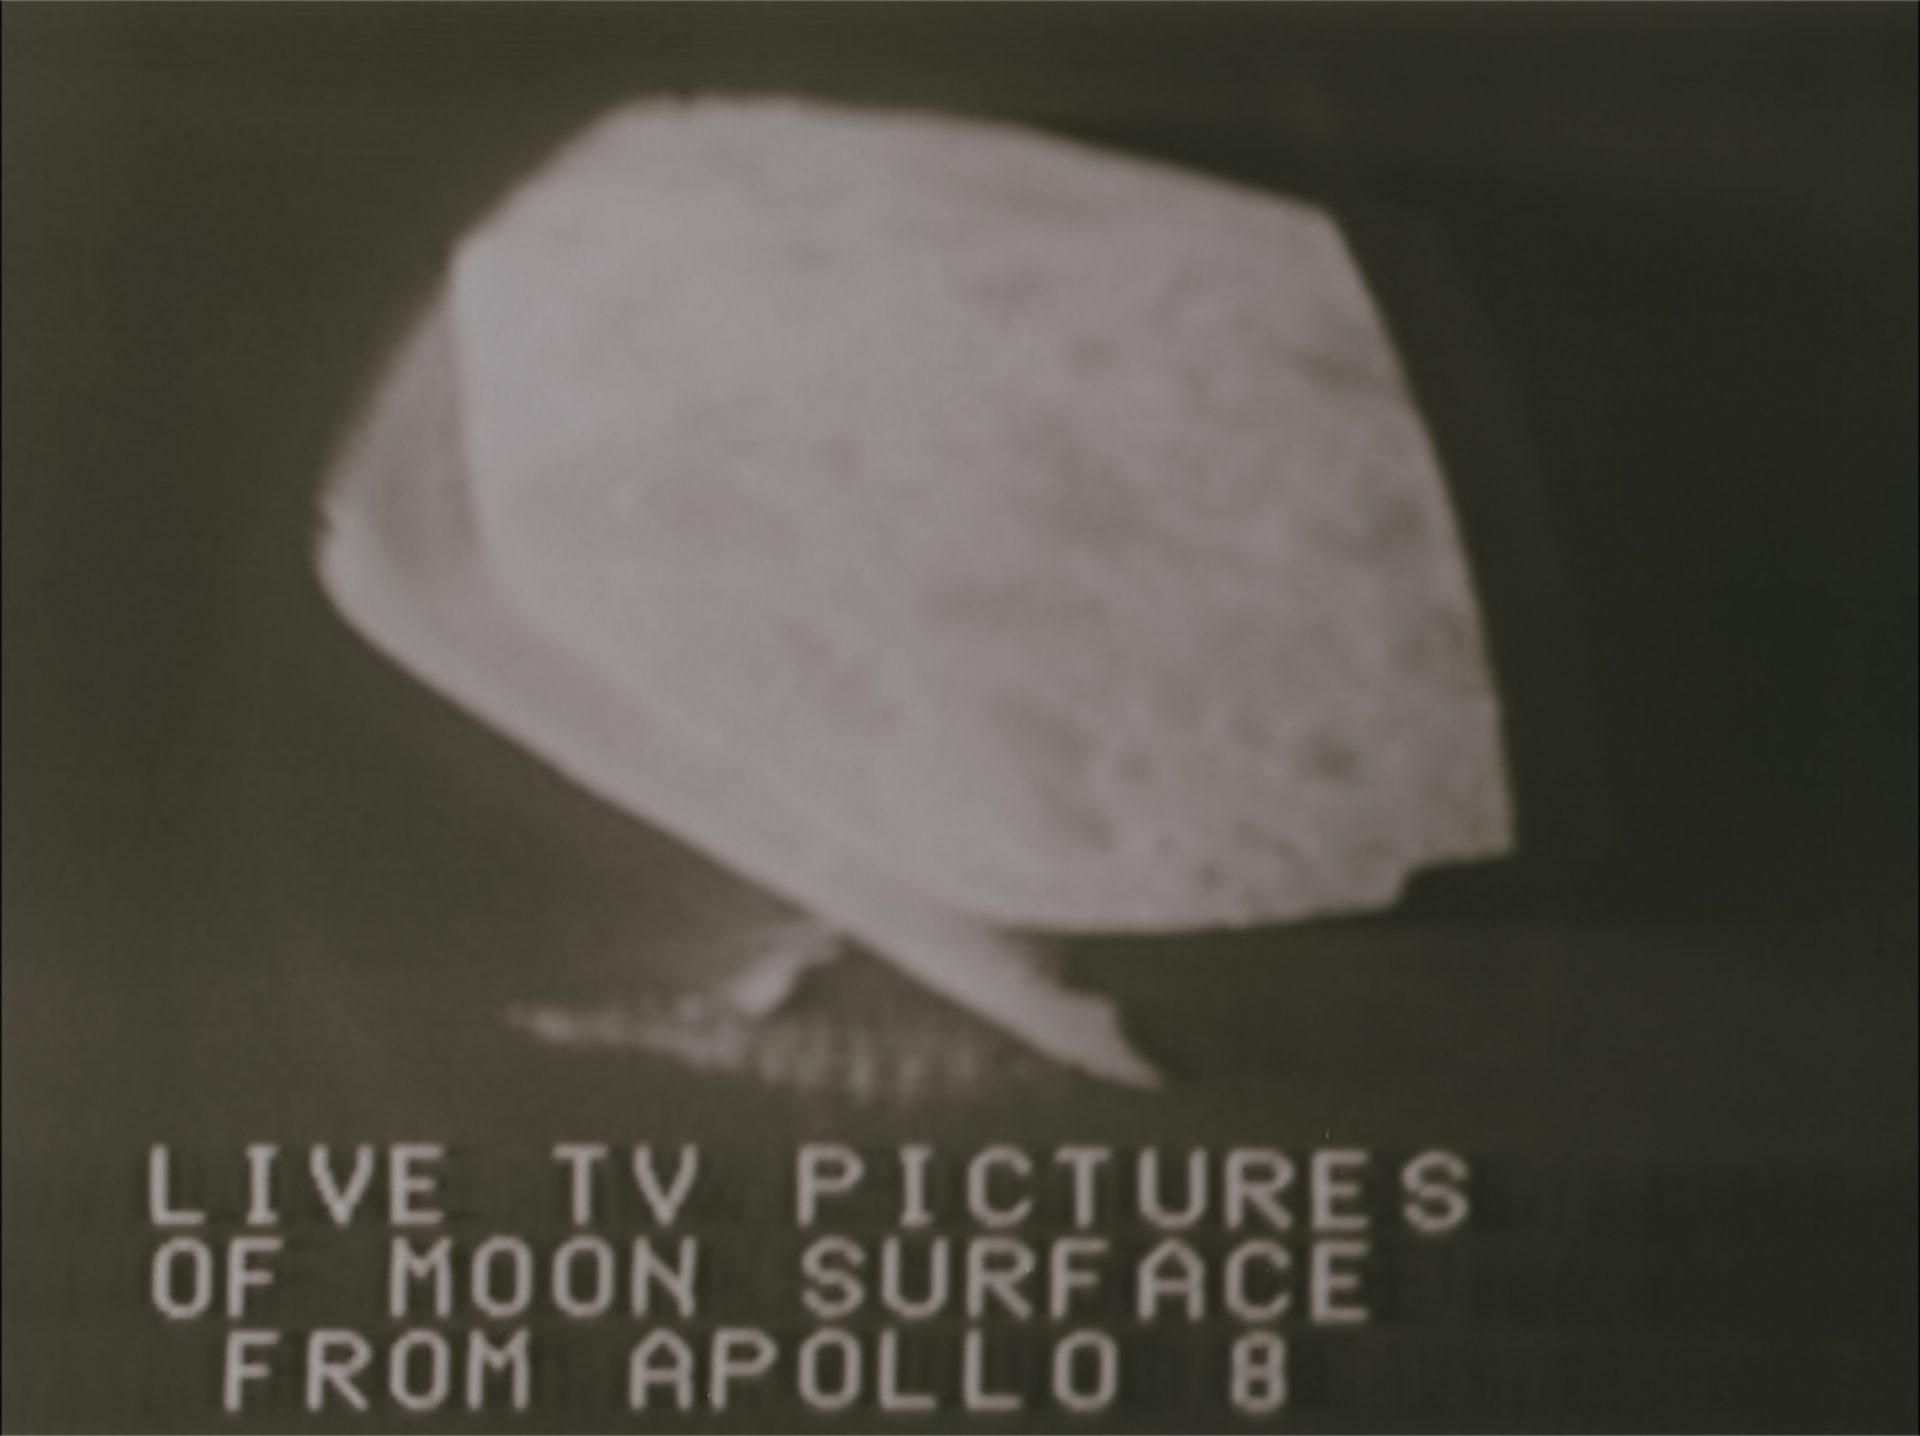 Apollo 8 live TV vom Mond